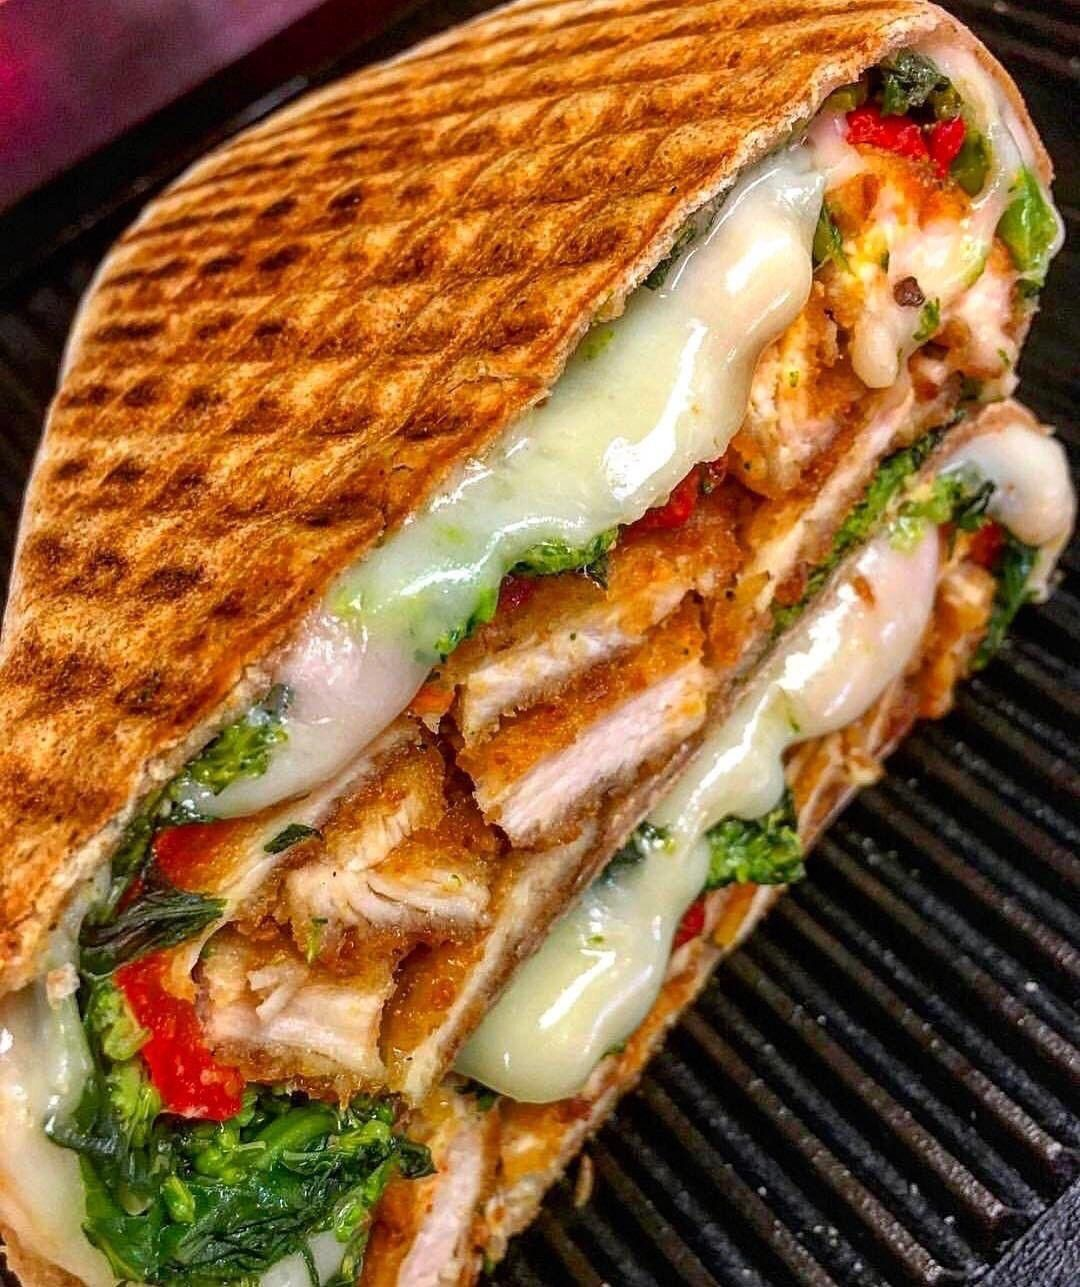 NYC Crispy Chicken Paninininini food street videos cooking